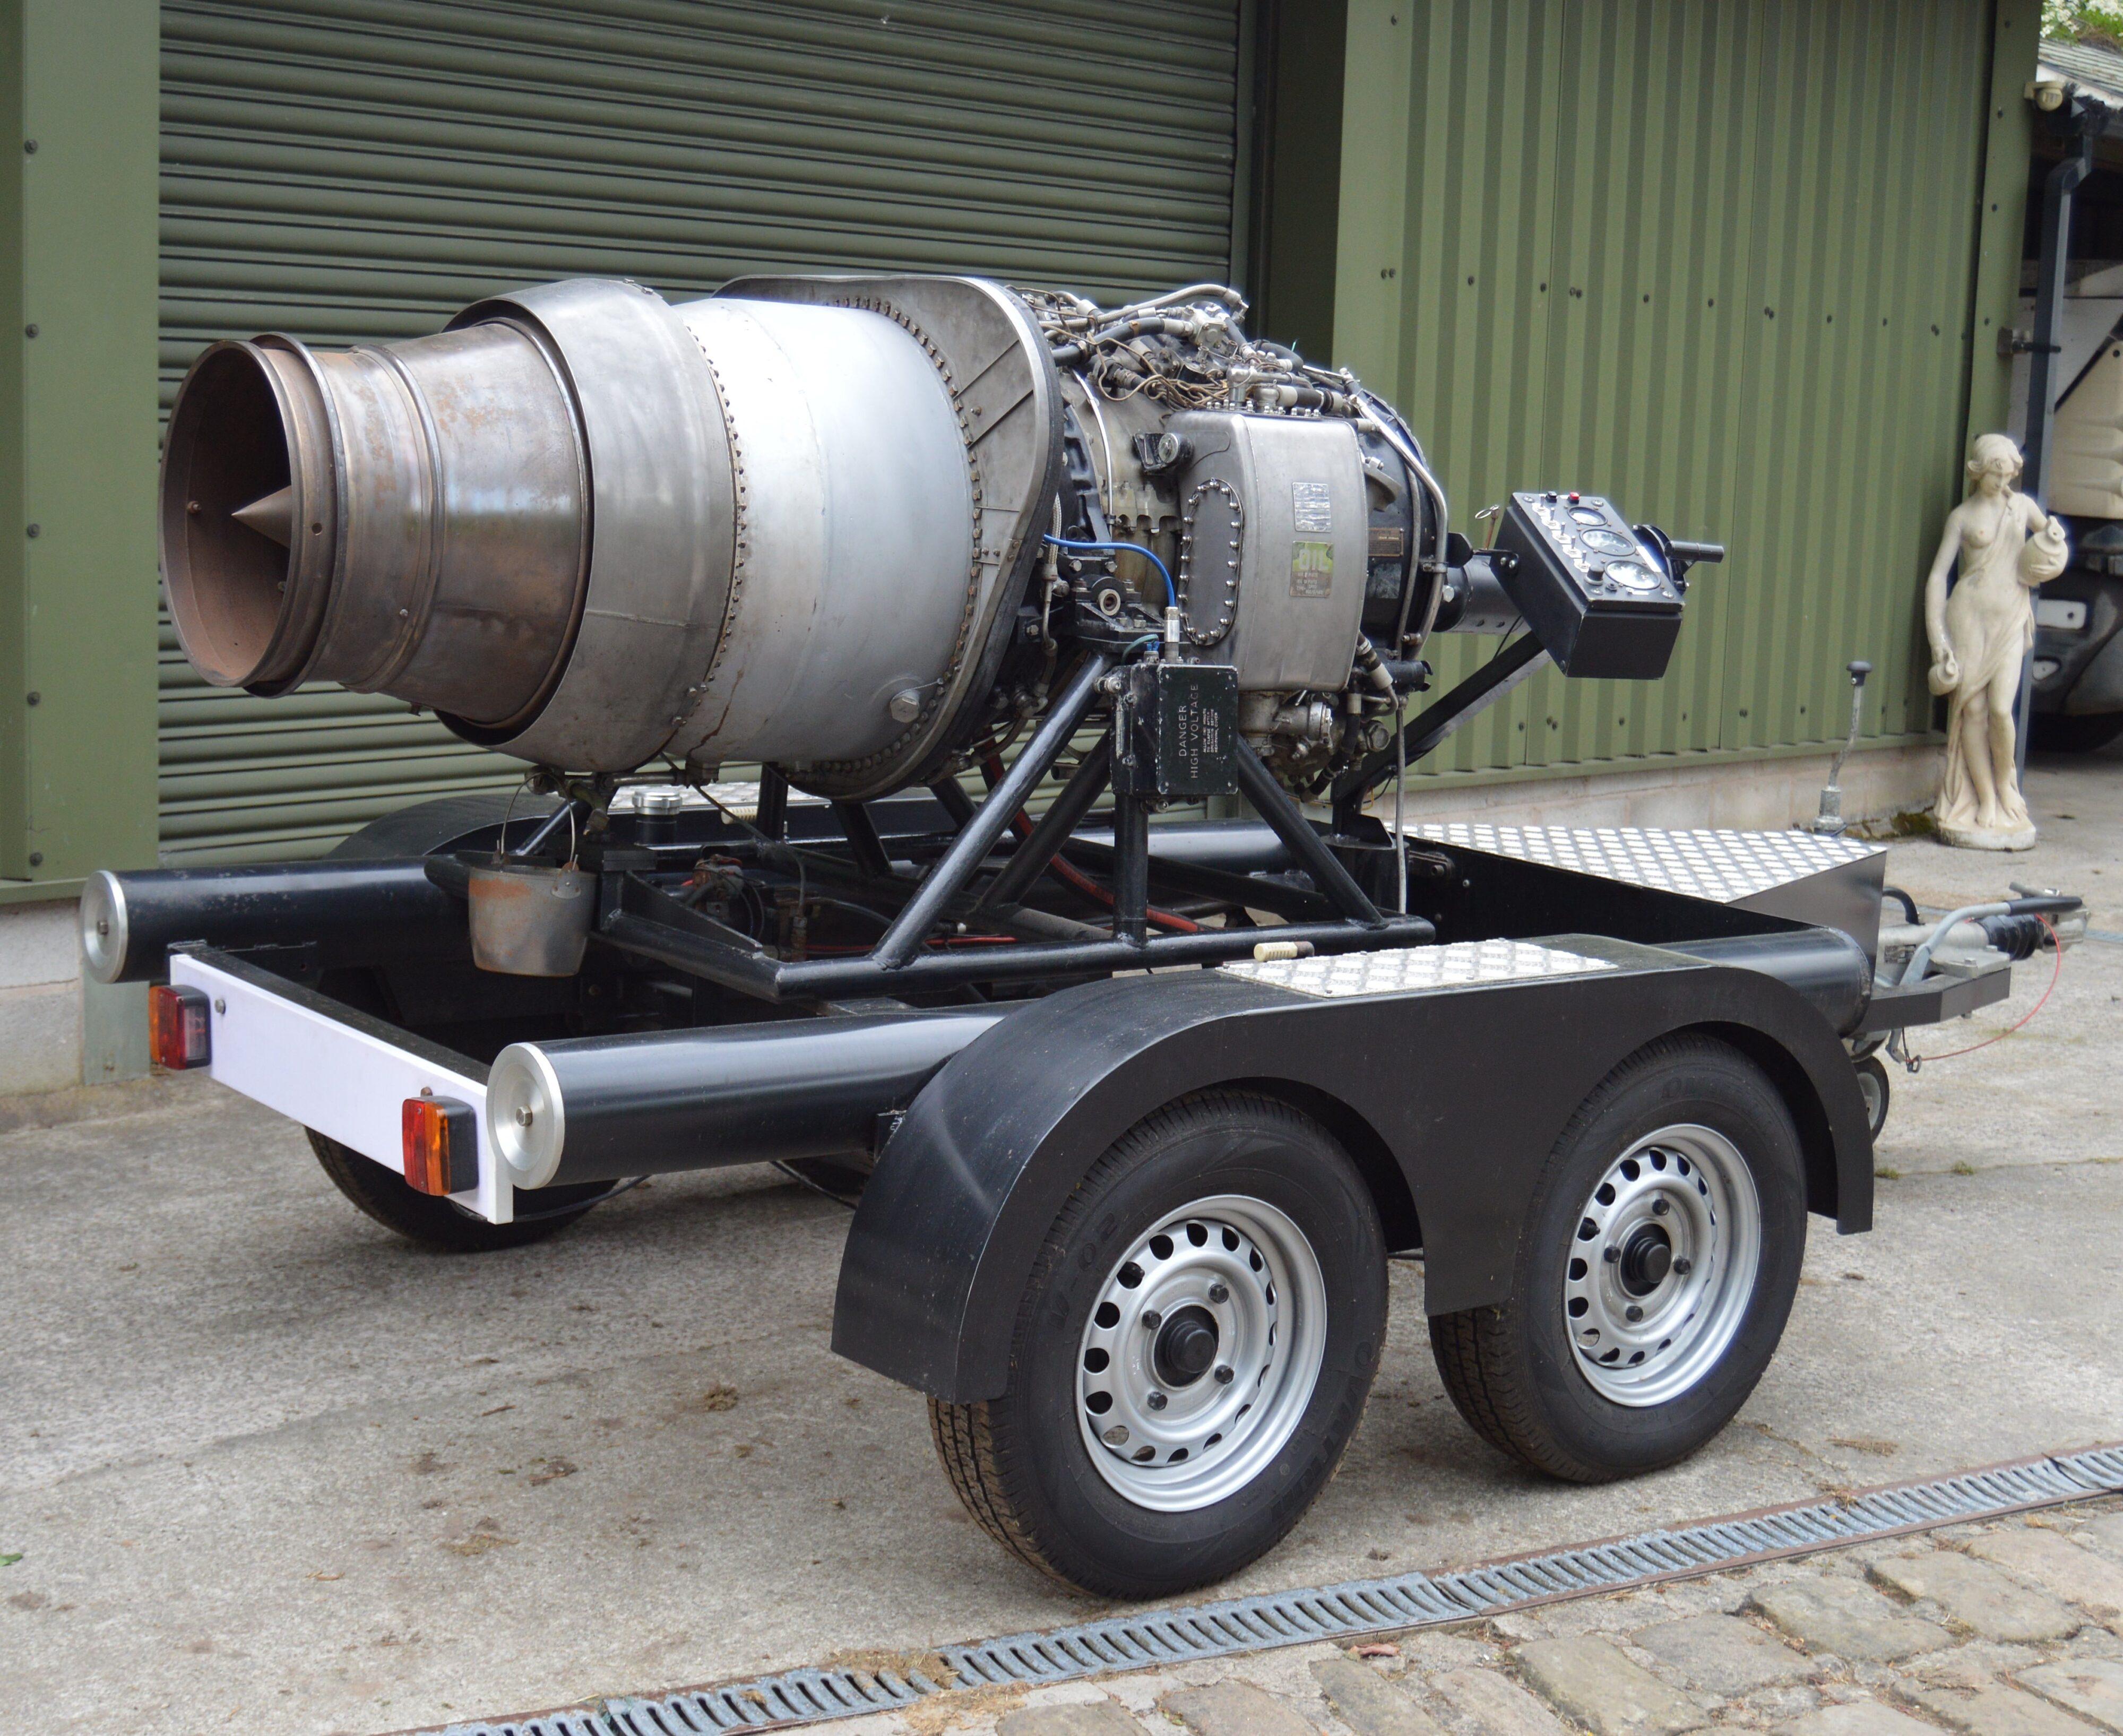 Bristol Siddeley Viper Turbojet Engine